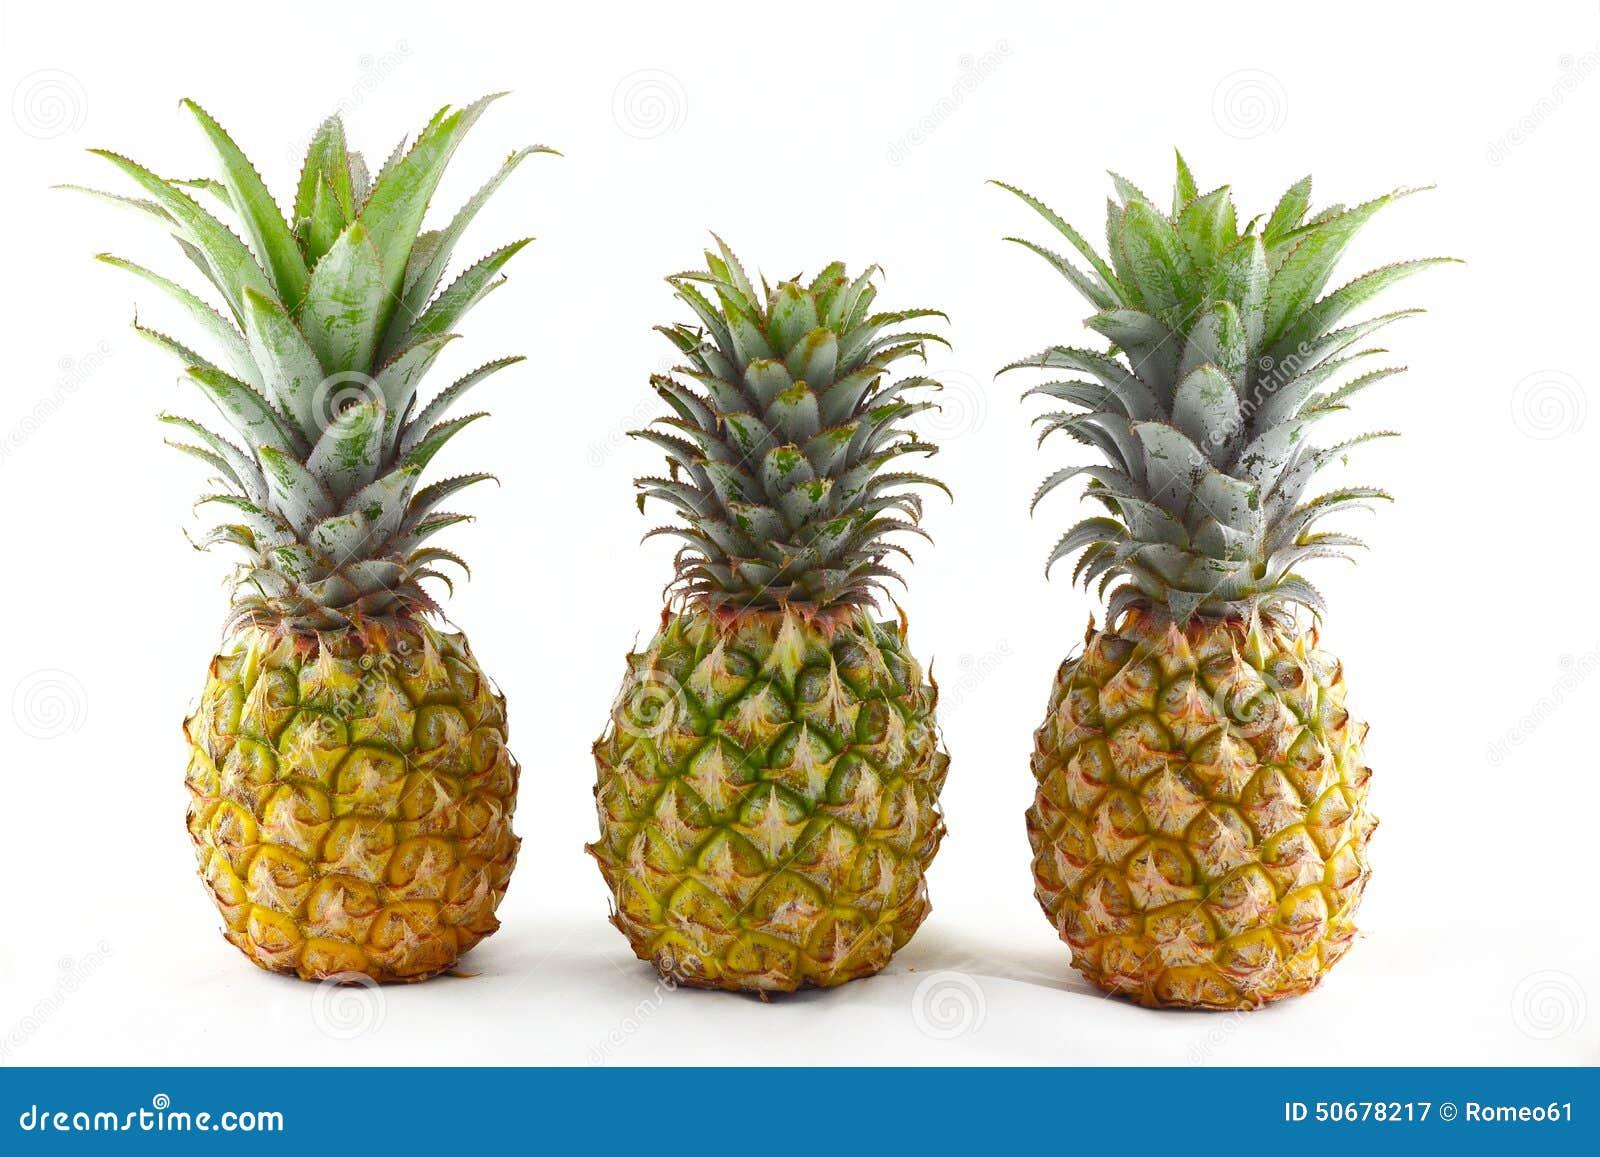 Download 在空白背景的菠萝 库存图片. 图片 包括有 背包, 菠萝, 水多, 点心, 食物, 关闭, 维生素, 自然 - 50678217